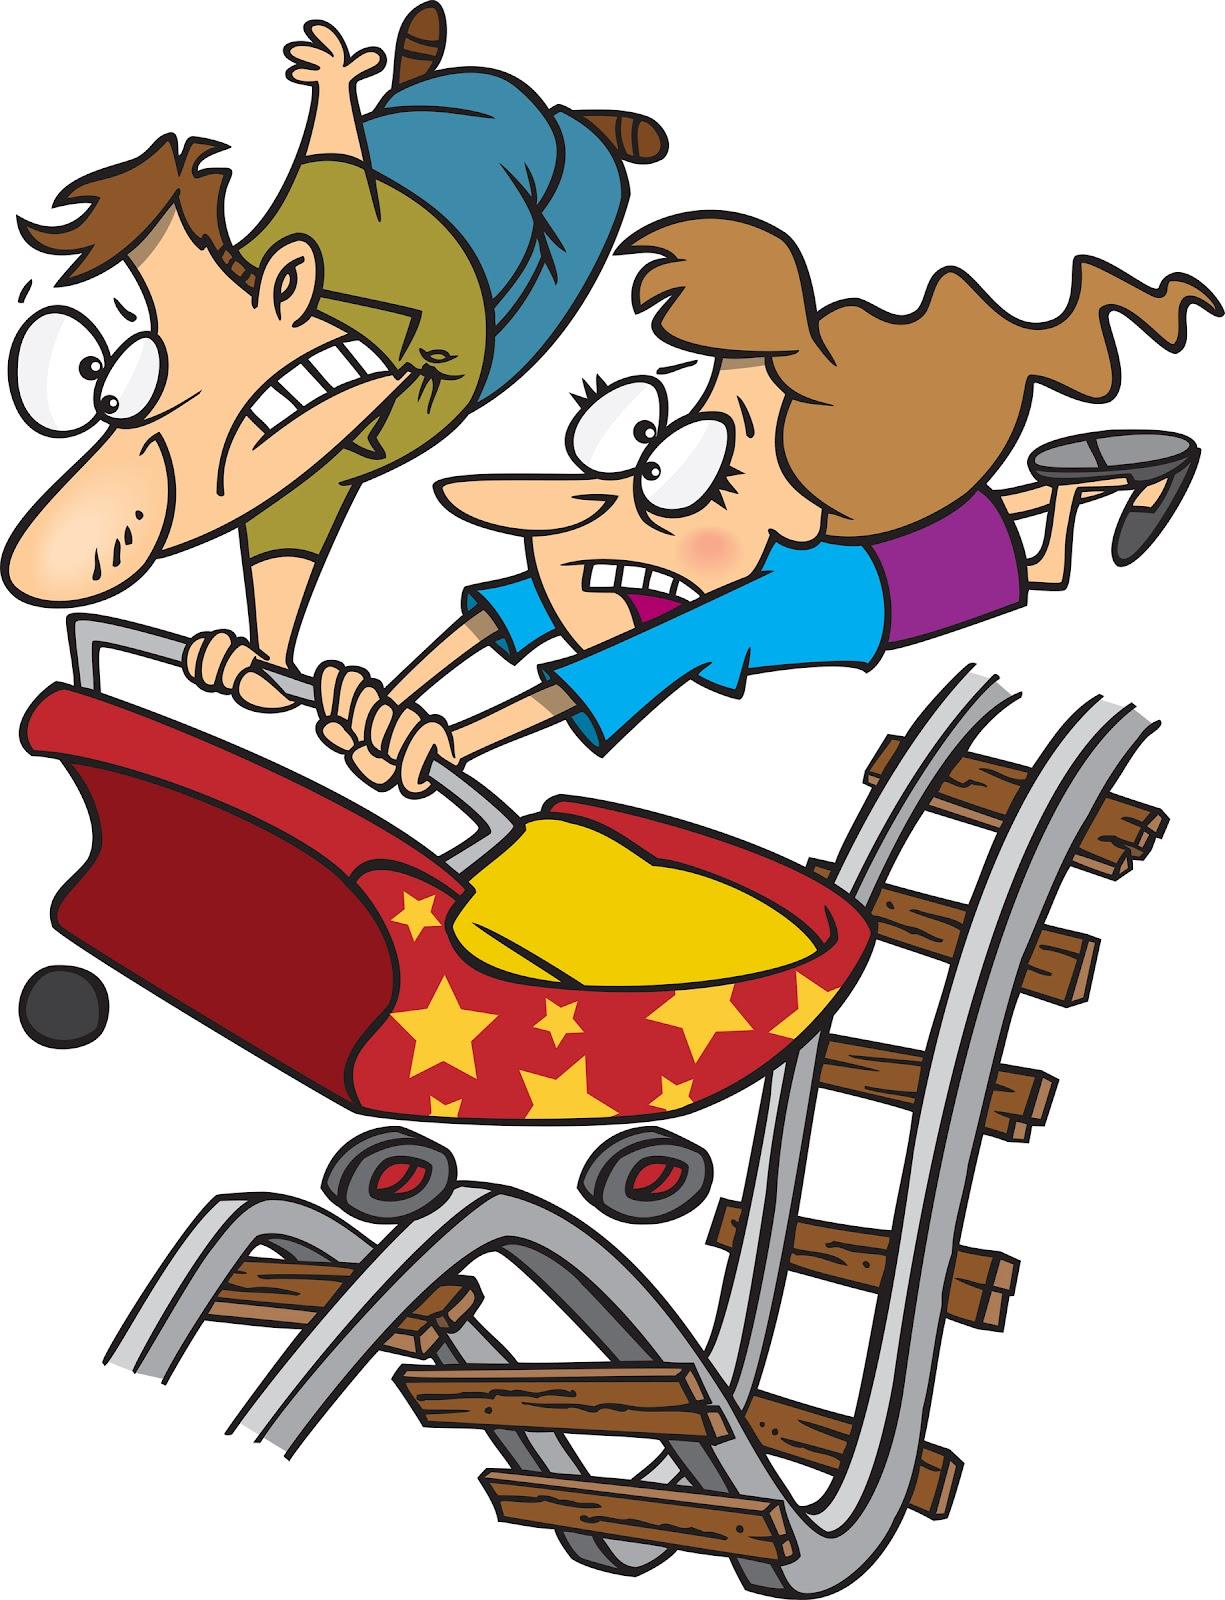 Cartoon clipart roller coaster Roller art Coaster Clipartix Roller